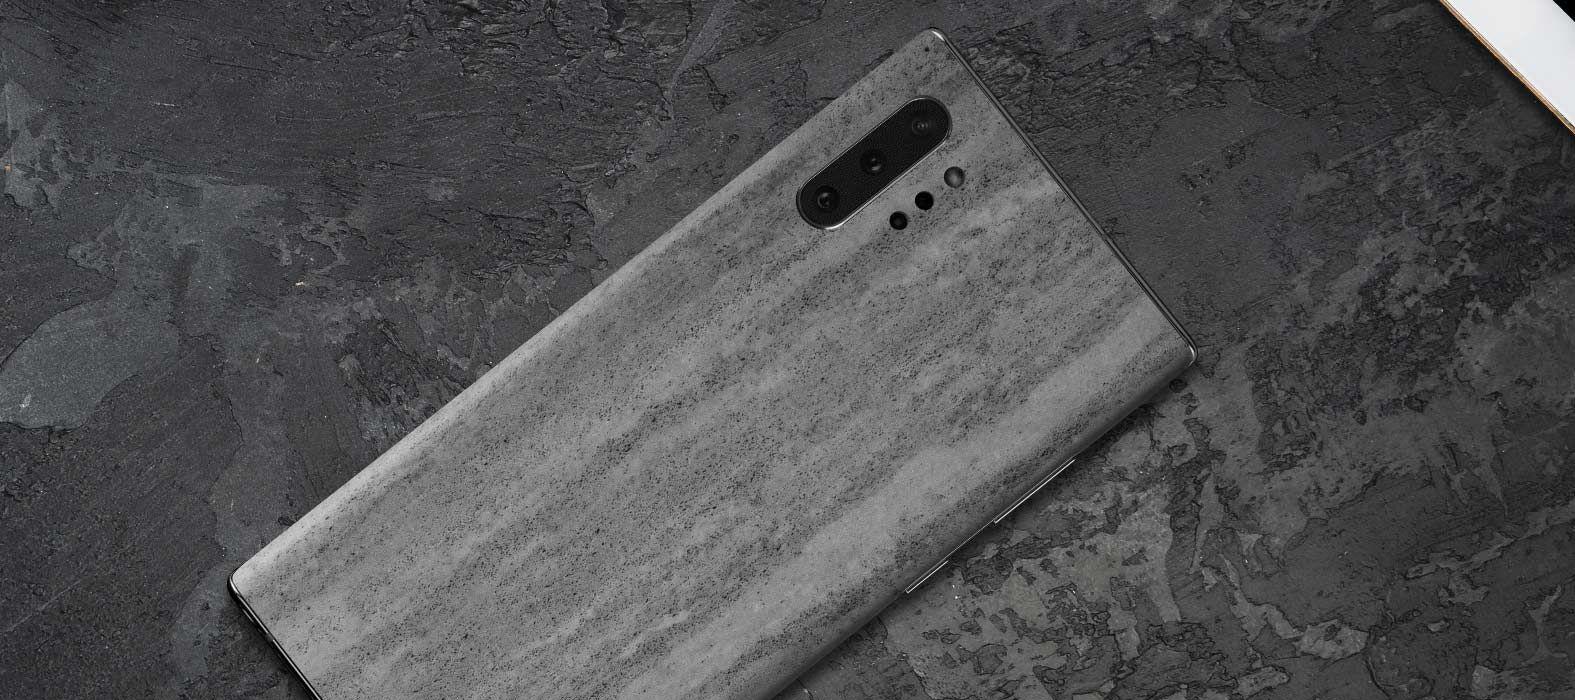 Galaxy-Note-10-Plus-Concrete Skins